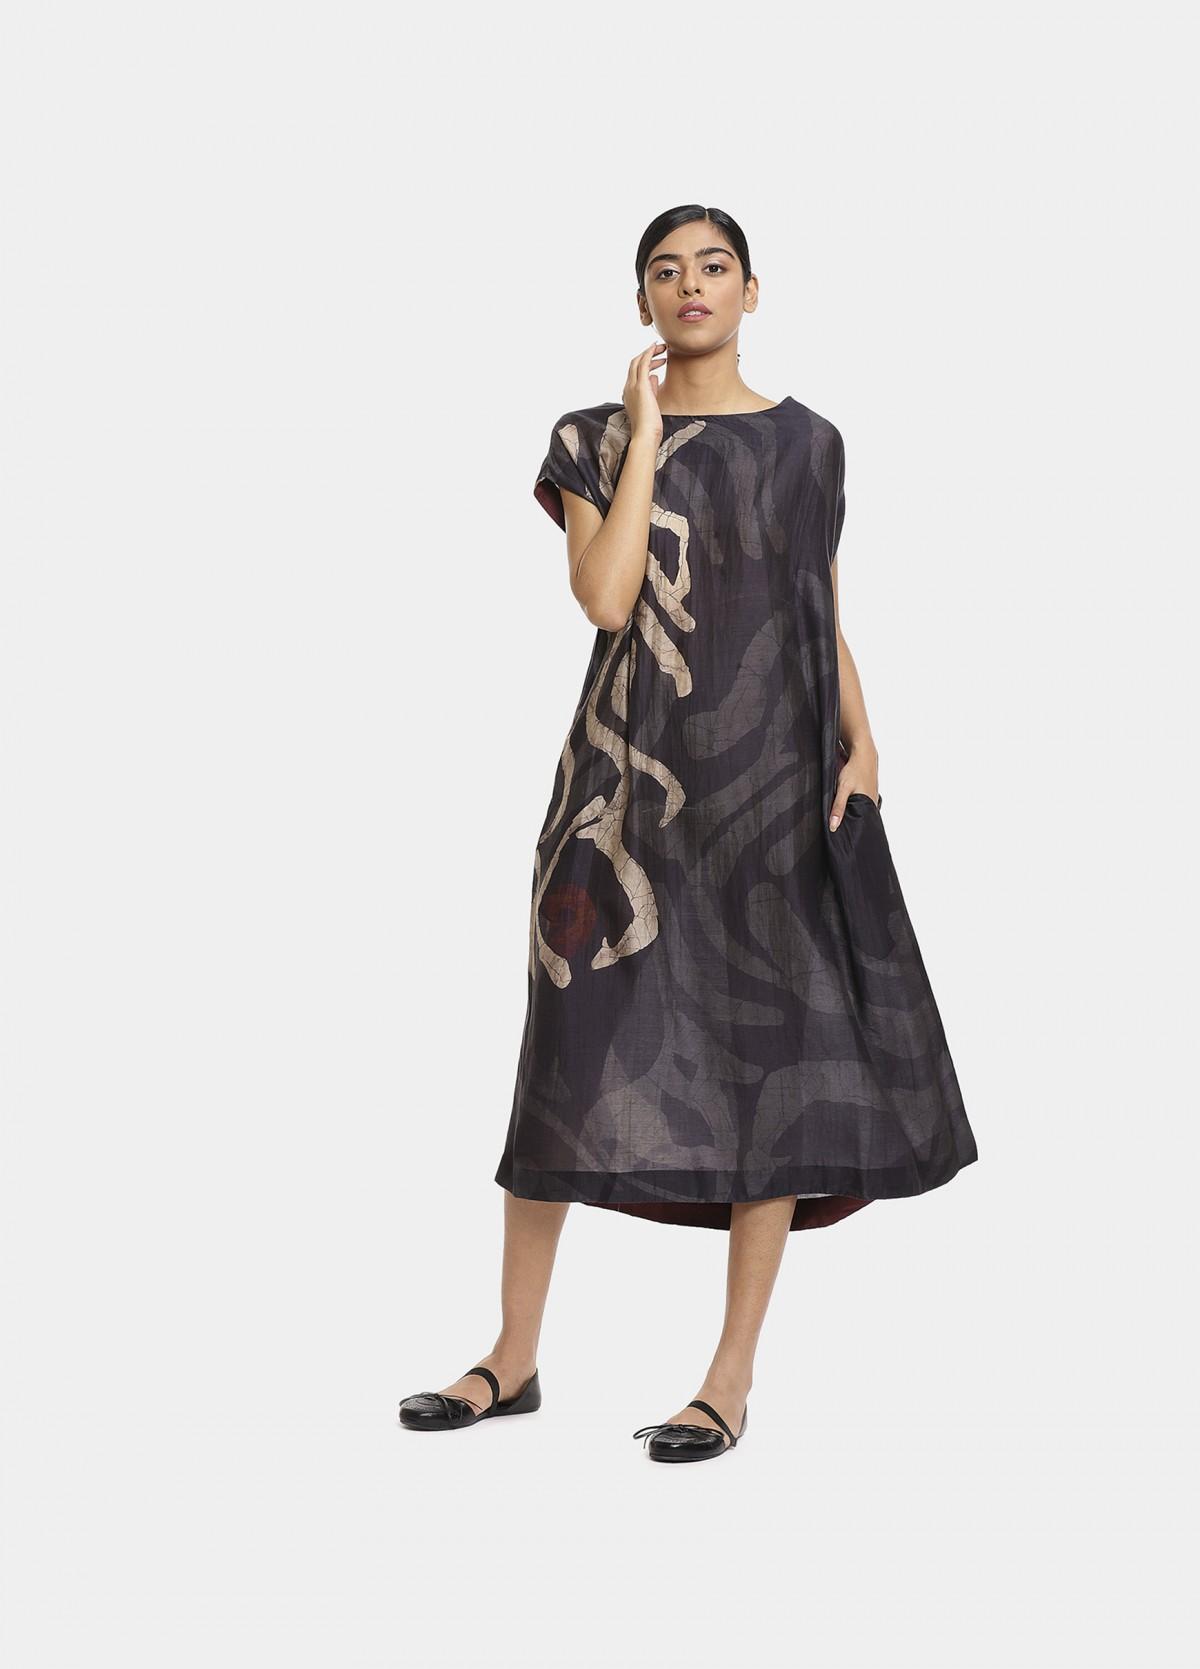 The Moody Marti Dress